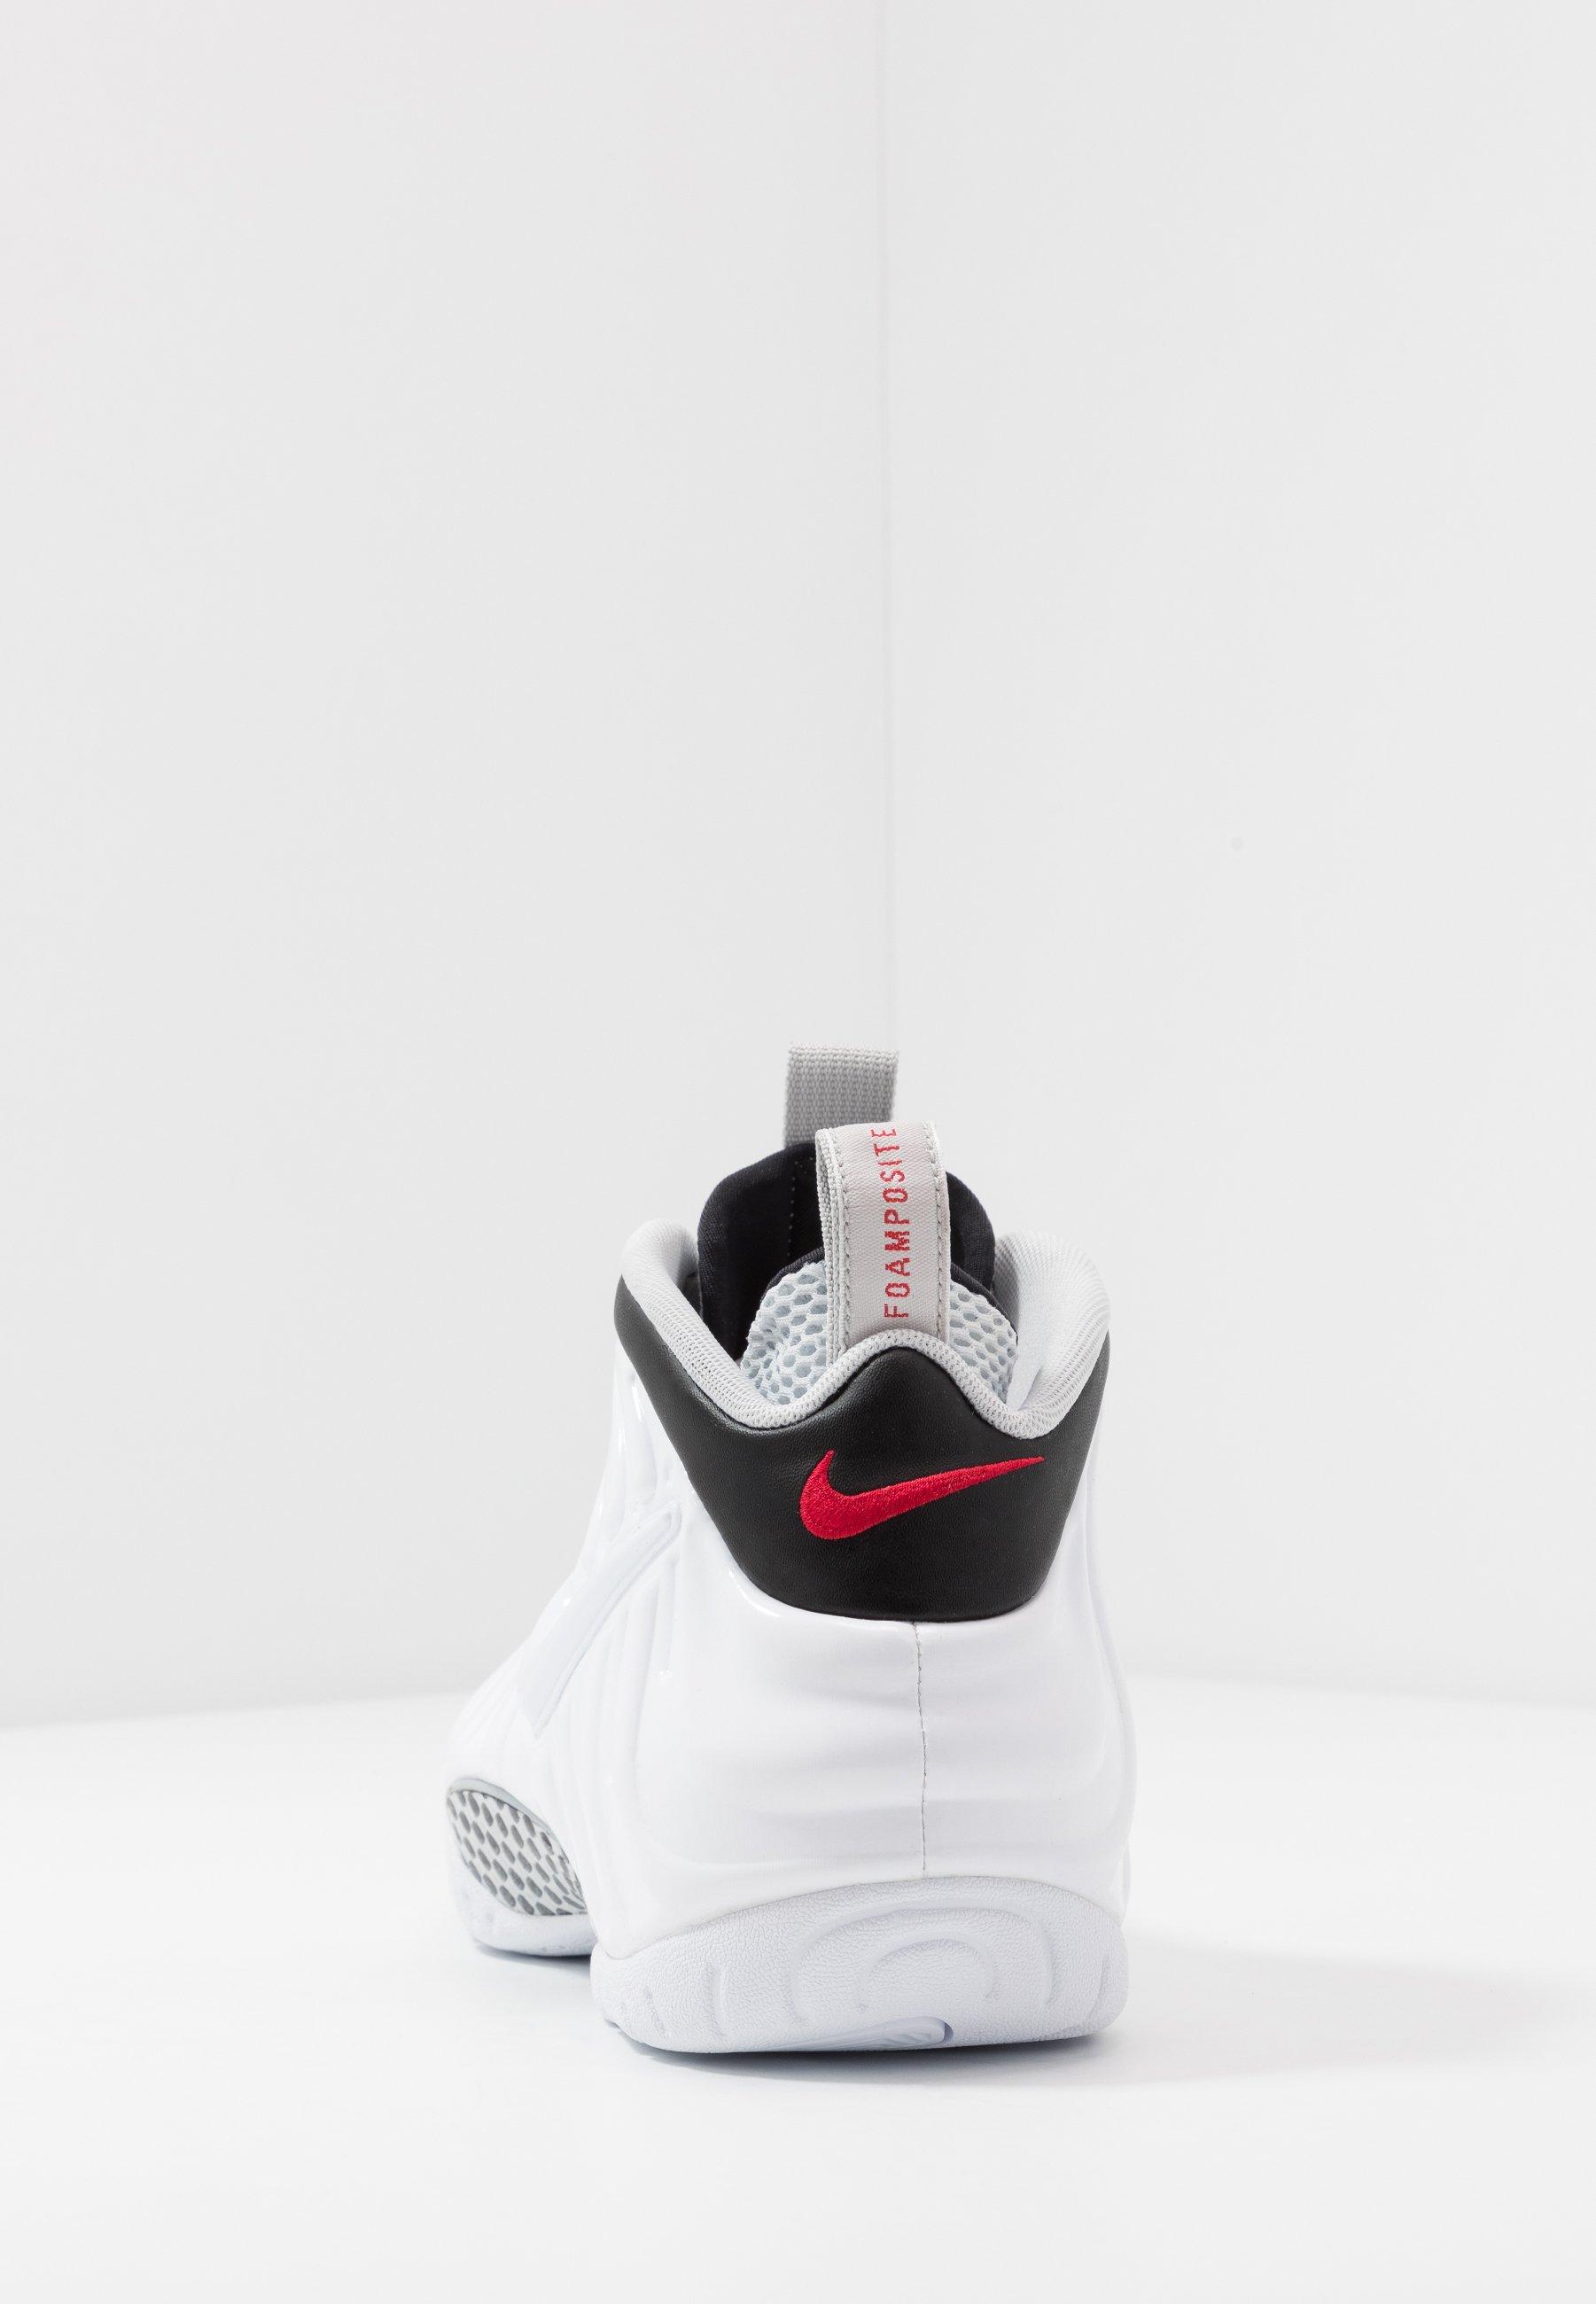 AIR FOAMPOSITE PRO Höga sneakers whiteblackuniversity redmetallic platinum